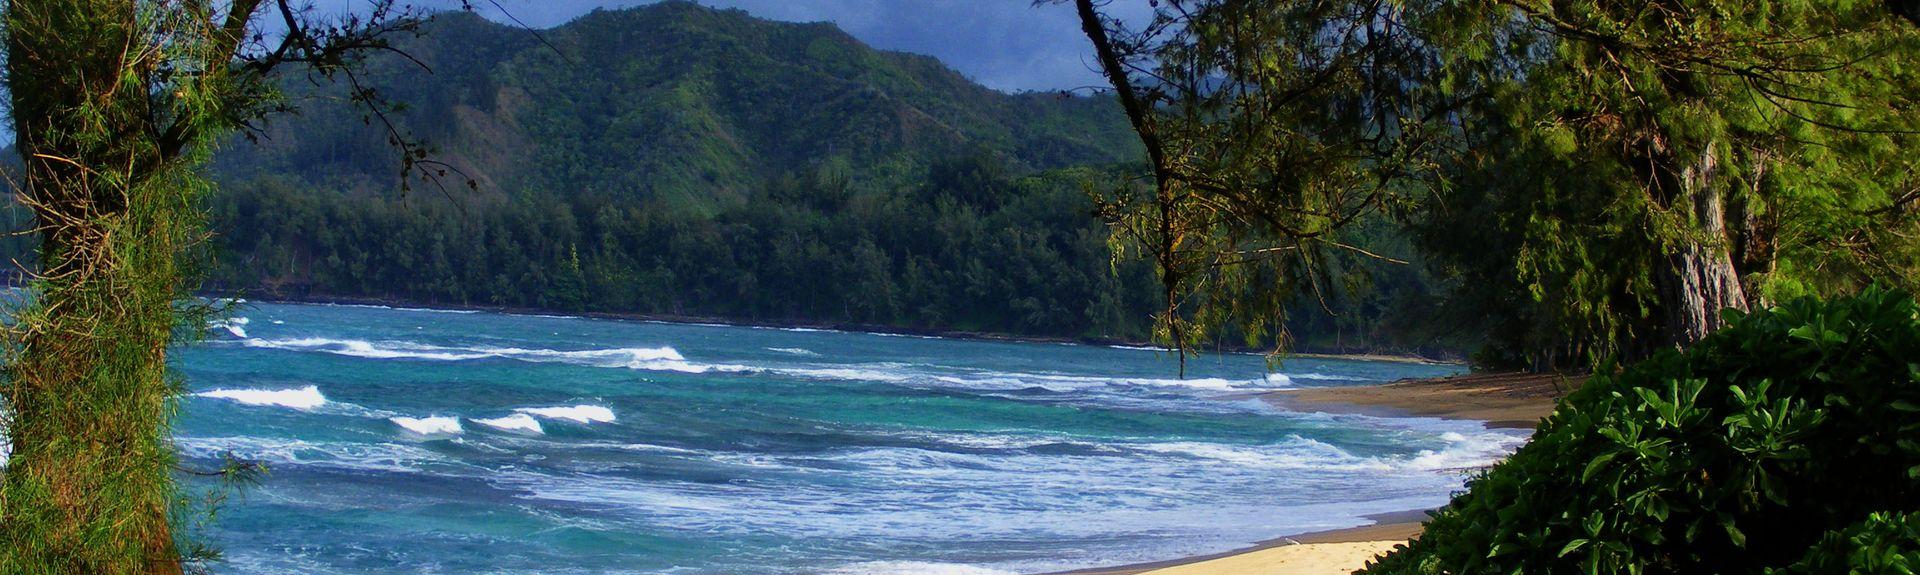 Nihilani Condos, Princeville, Hawaii, United States of America